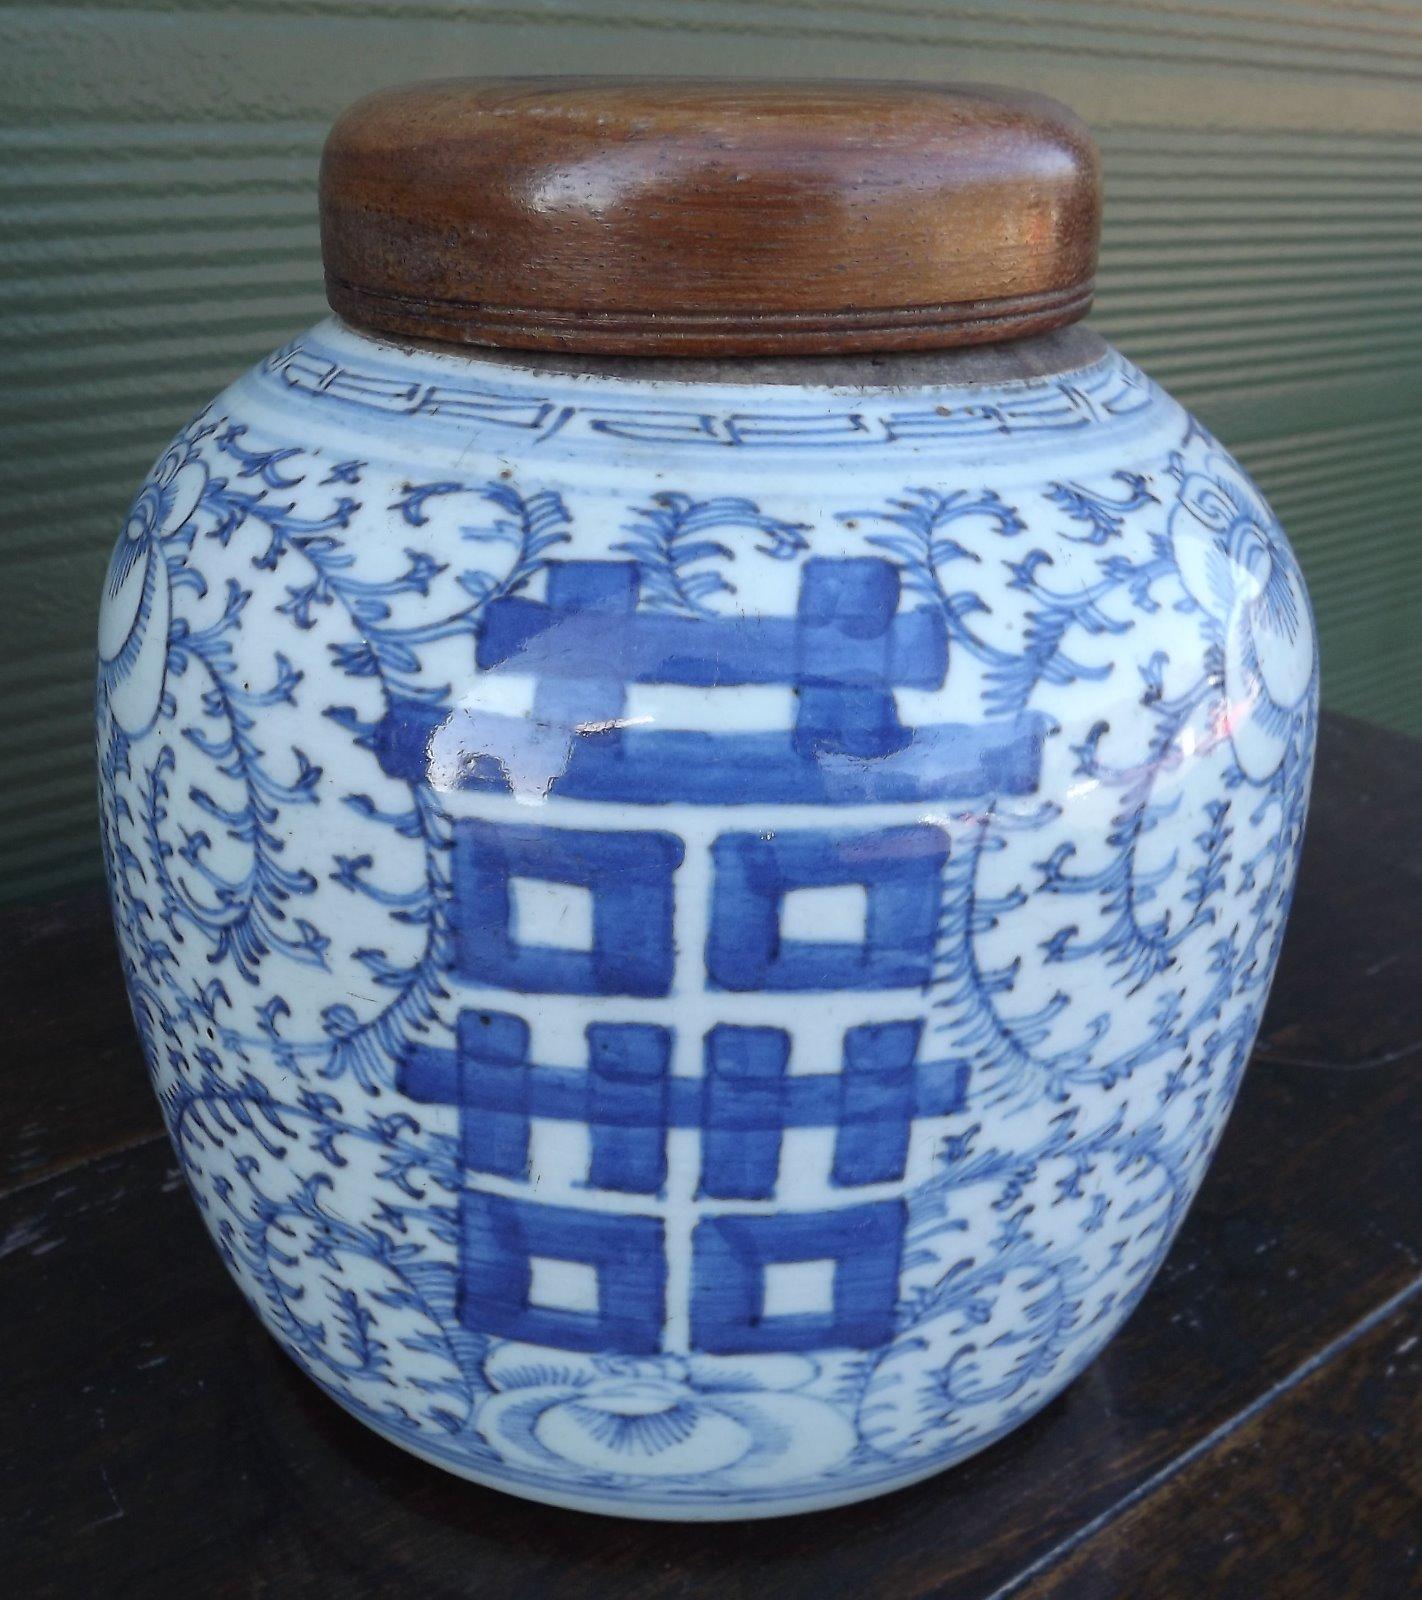 Antique 19th Century Chinese Pottery Ginger Jar 17837 La126269 Loveantiques Com